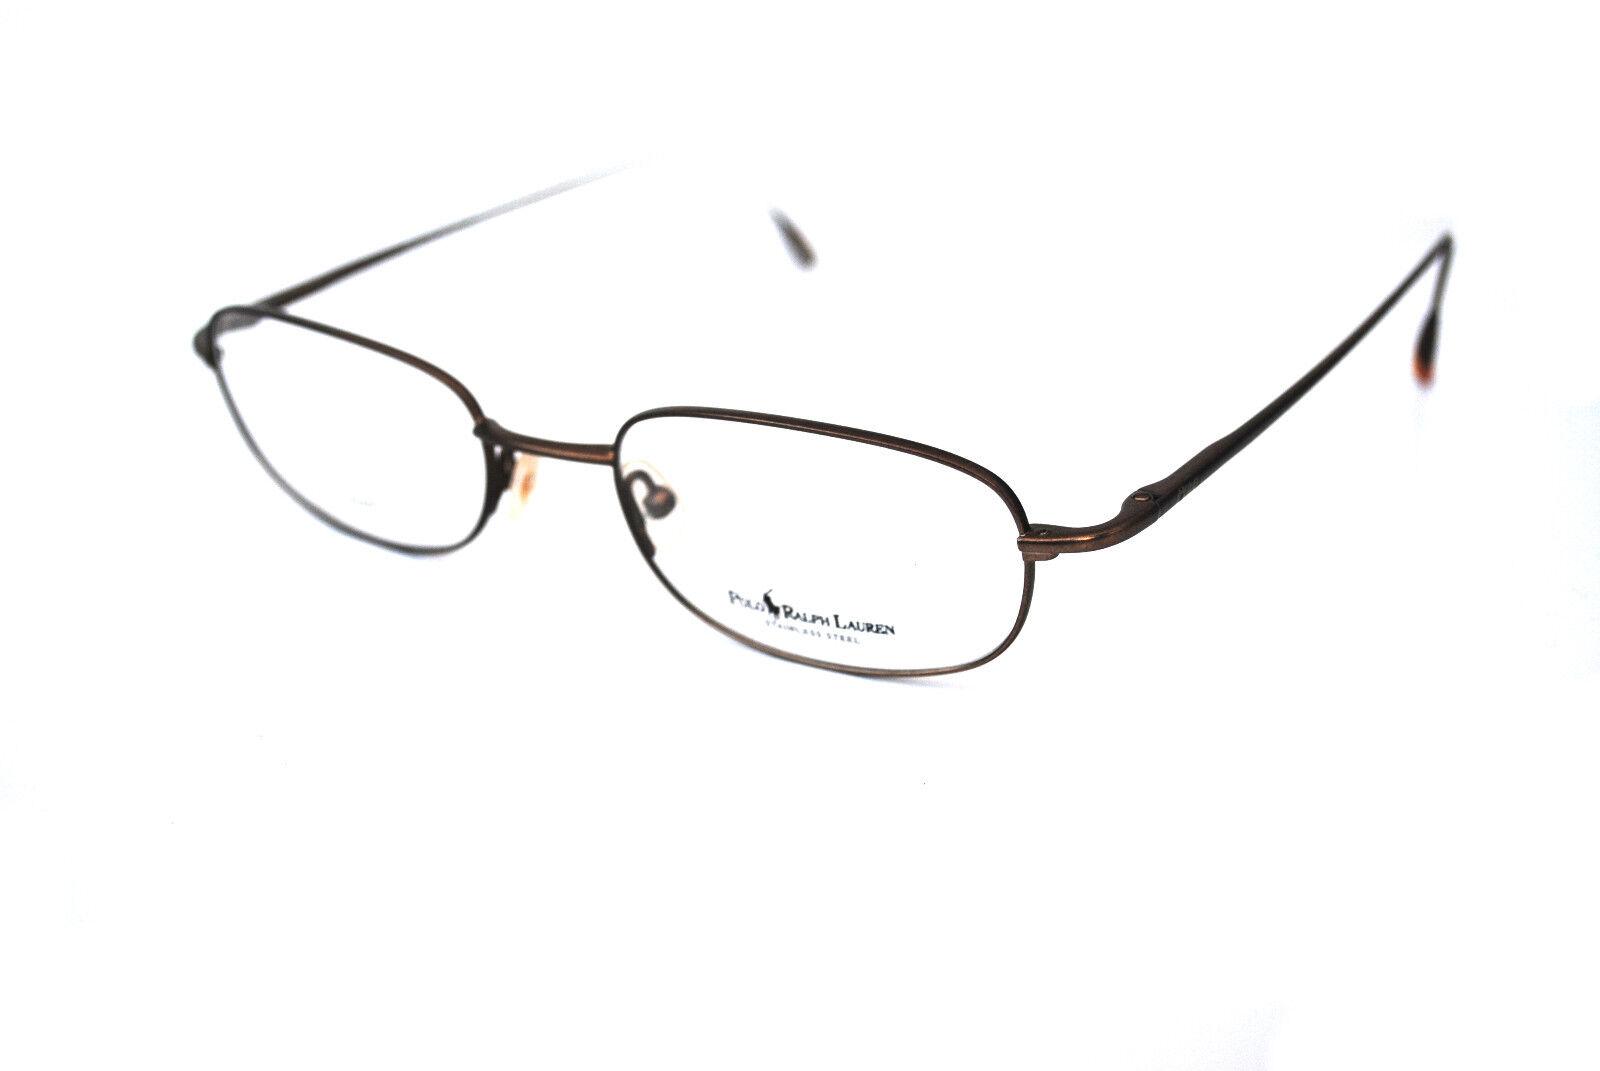 Ralph Lauren Polo RL368 Original Vintage Glasses Optical Frames Geek ...